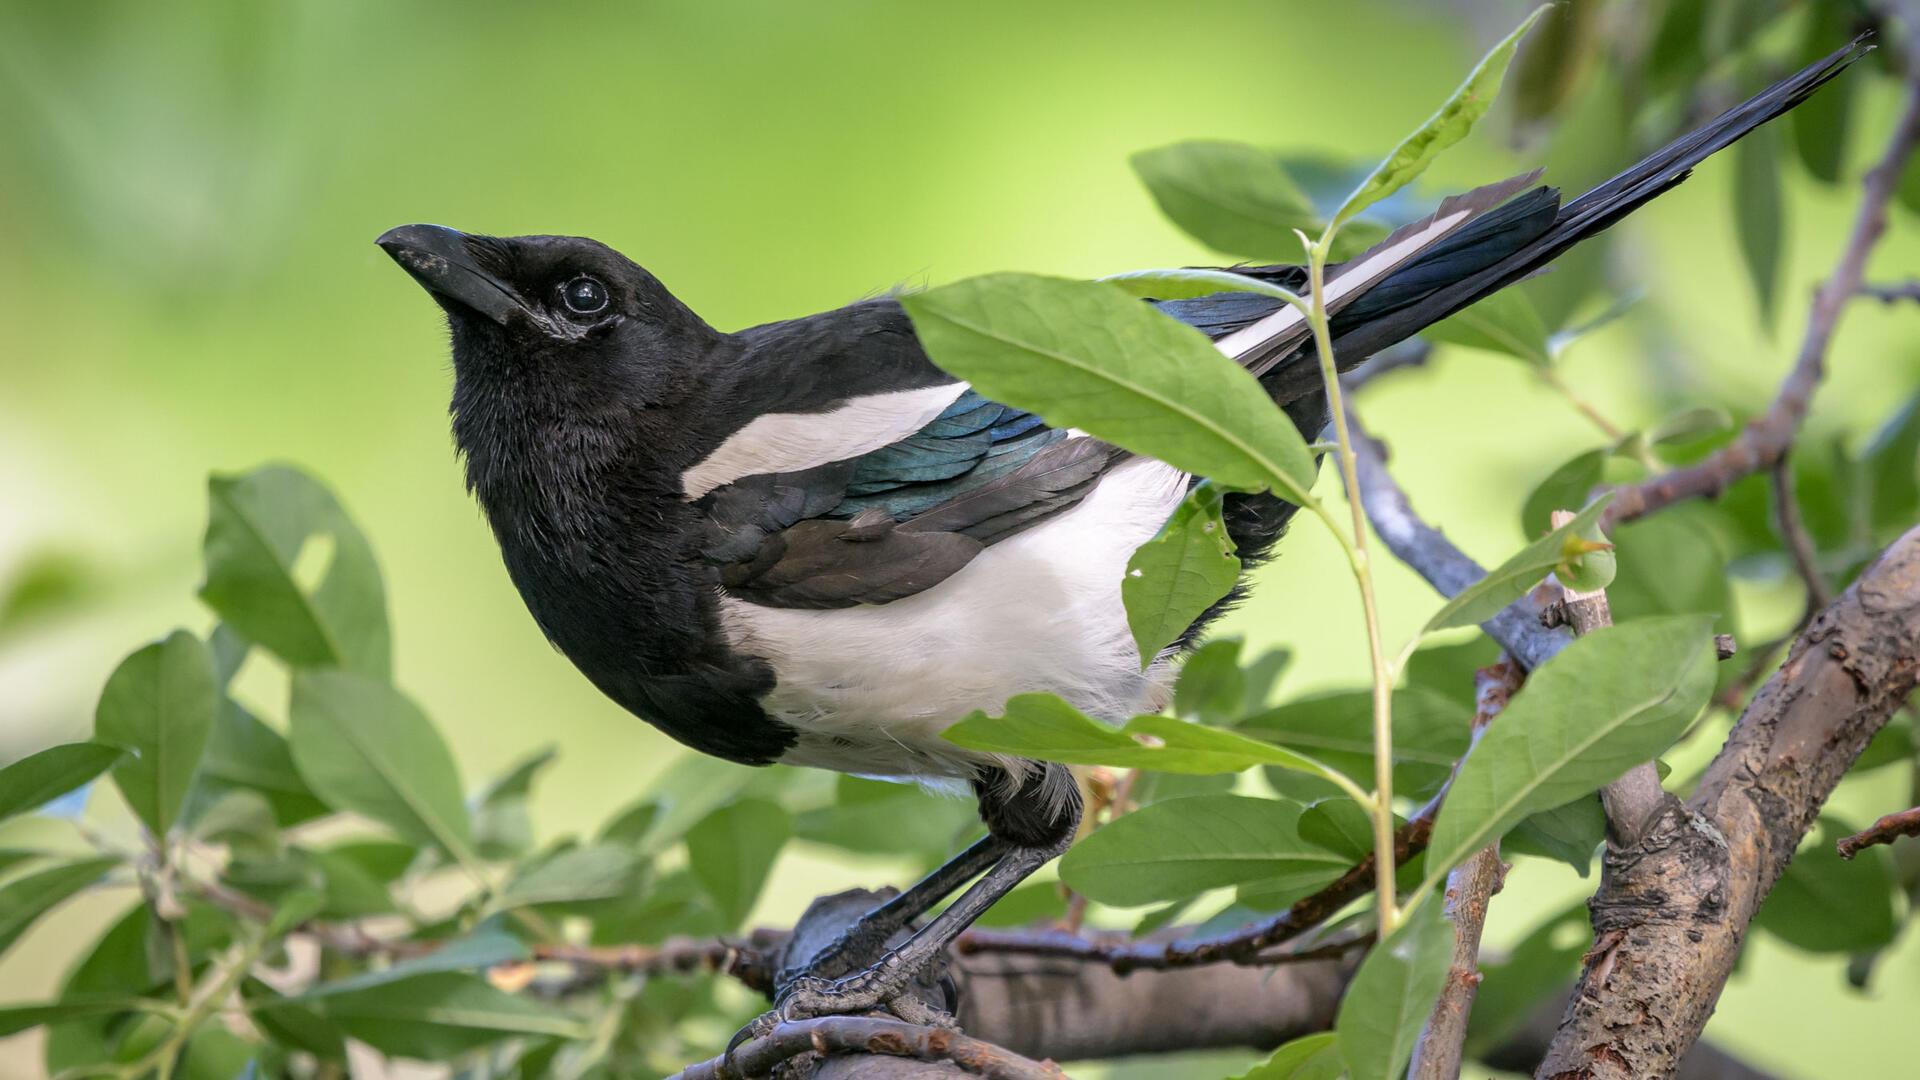 Black Billed Magpie Audubon Field Guide